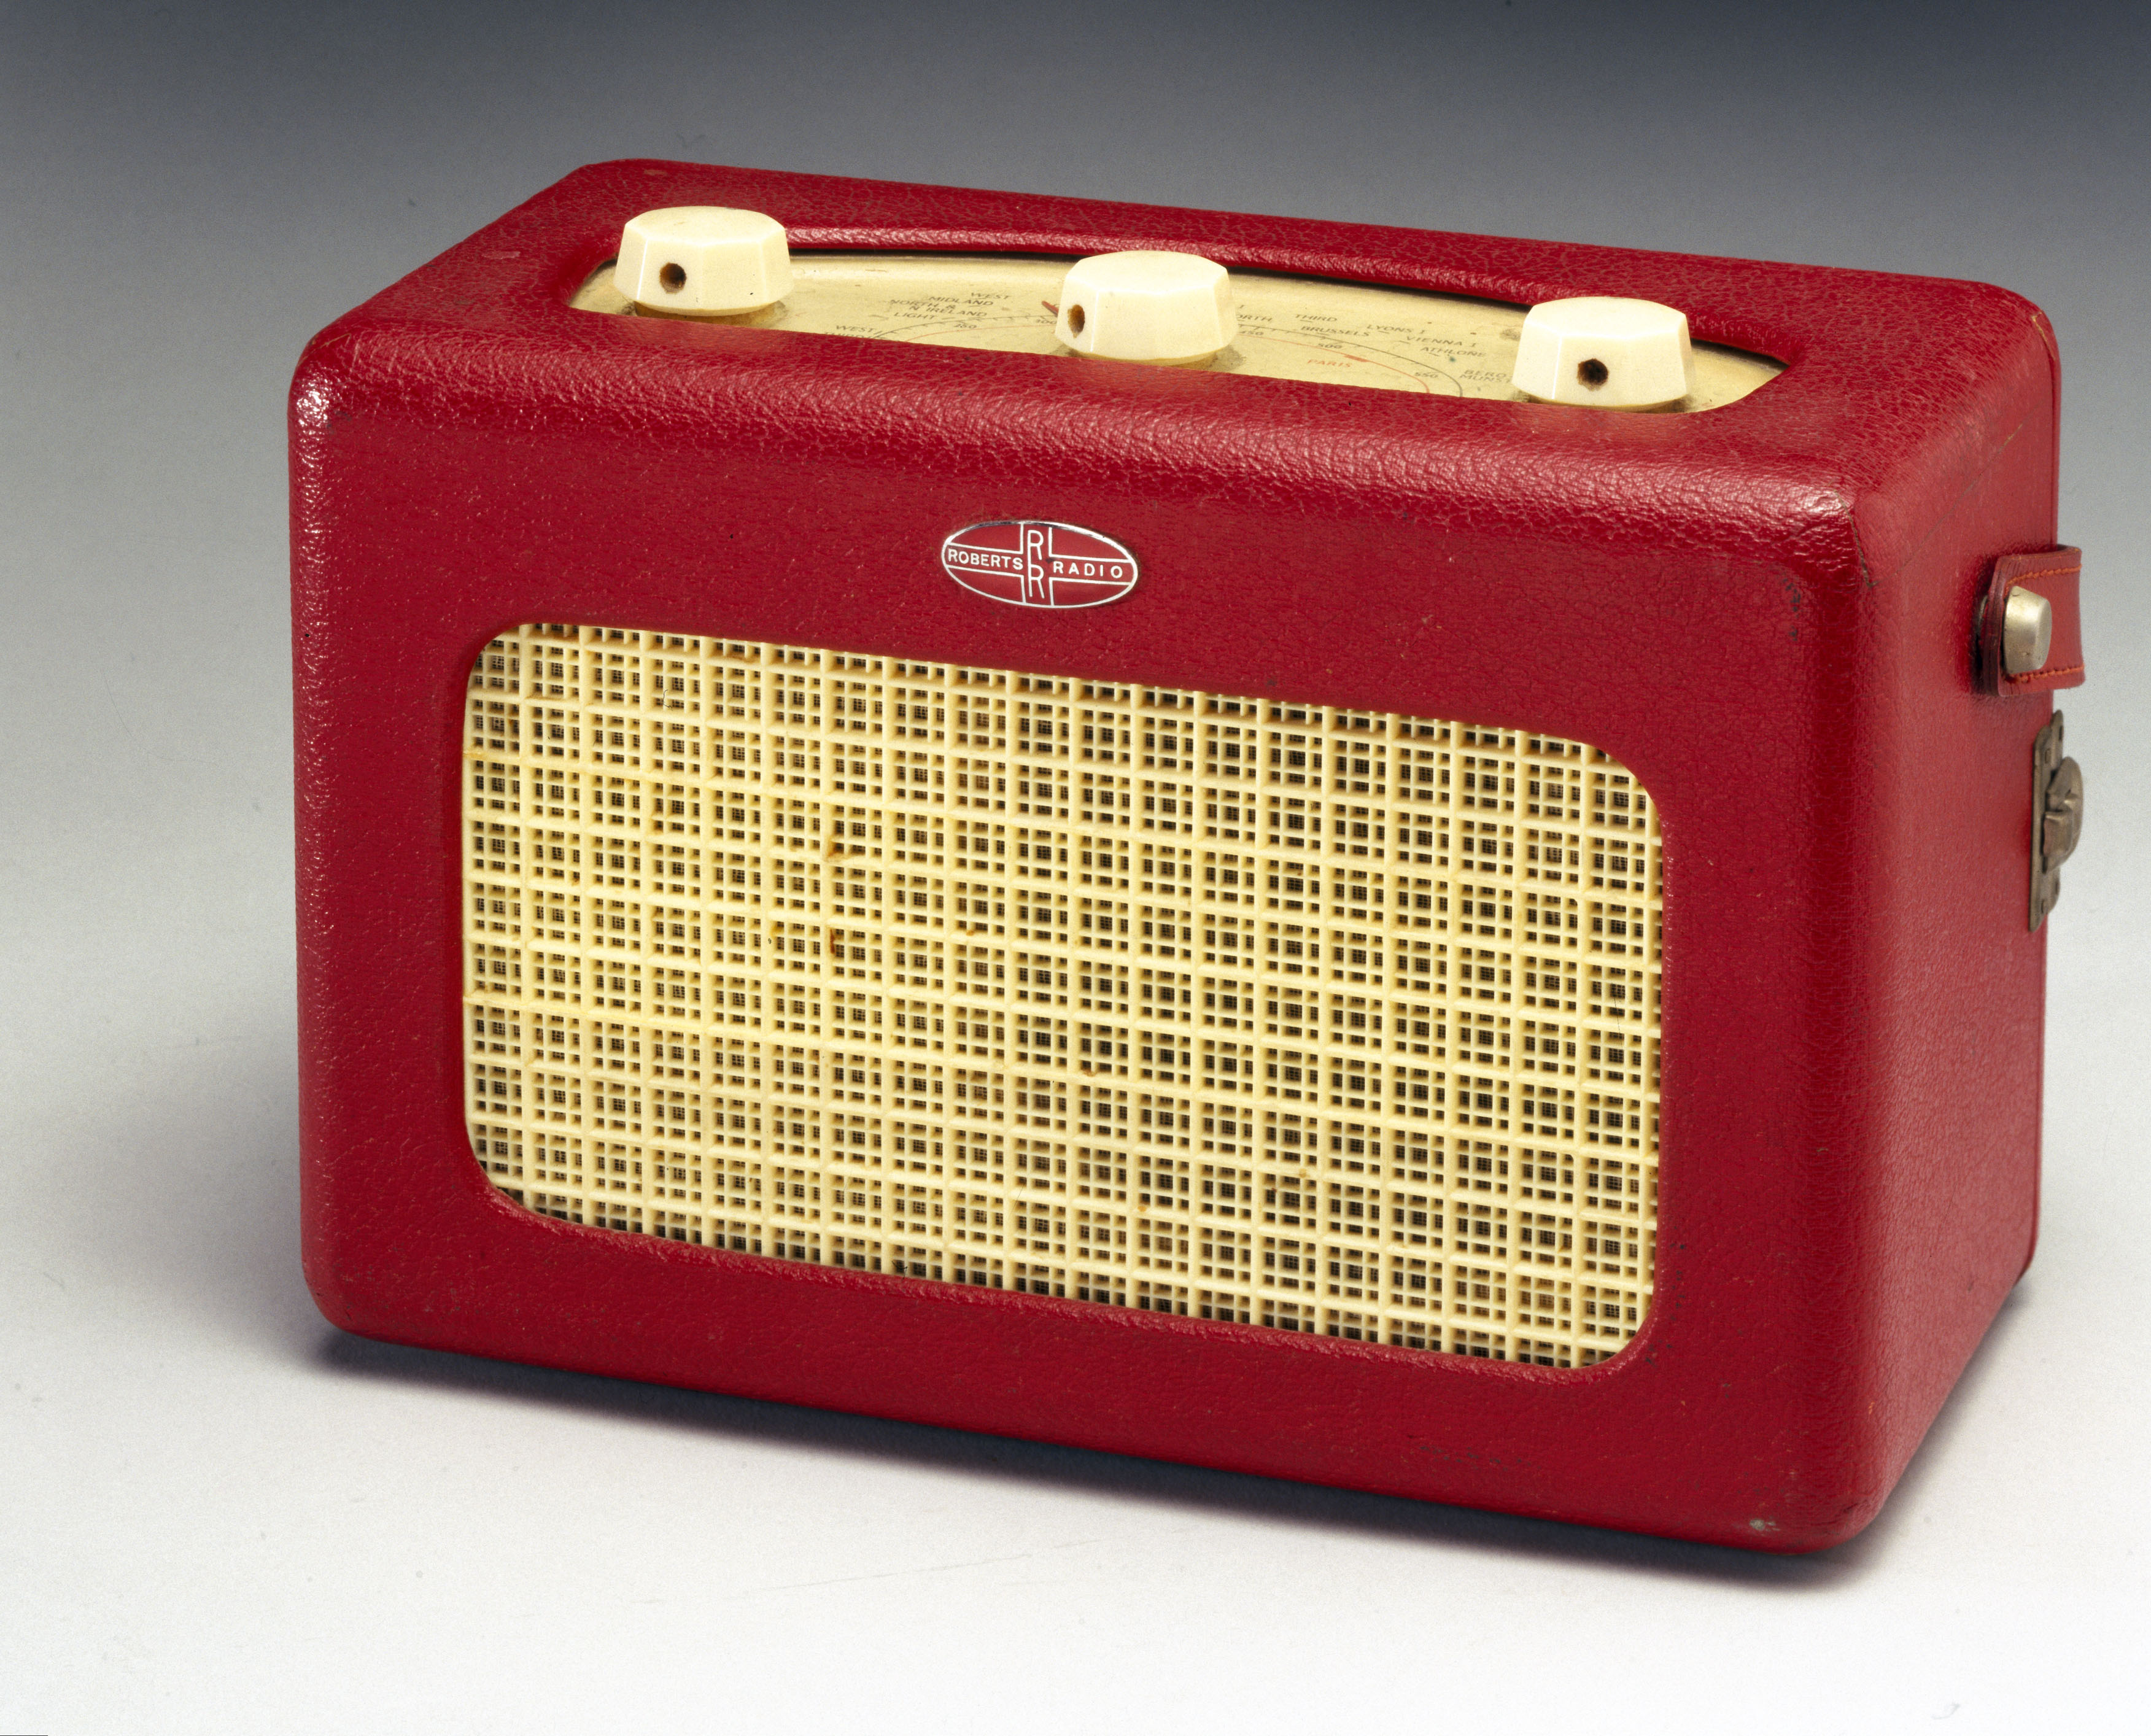 Valve-operated radio, 1955.